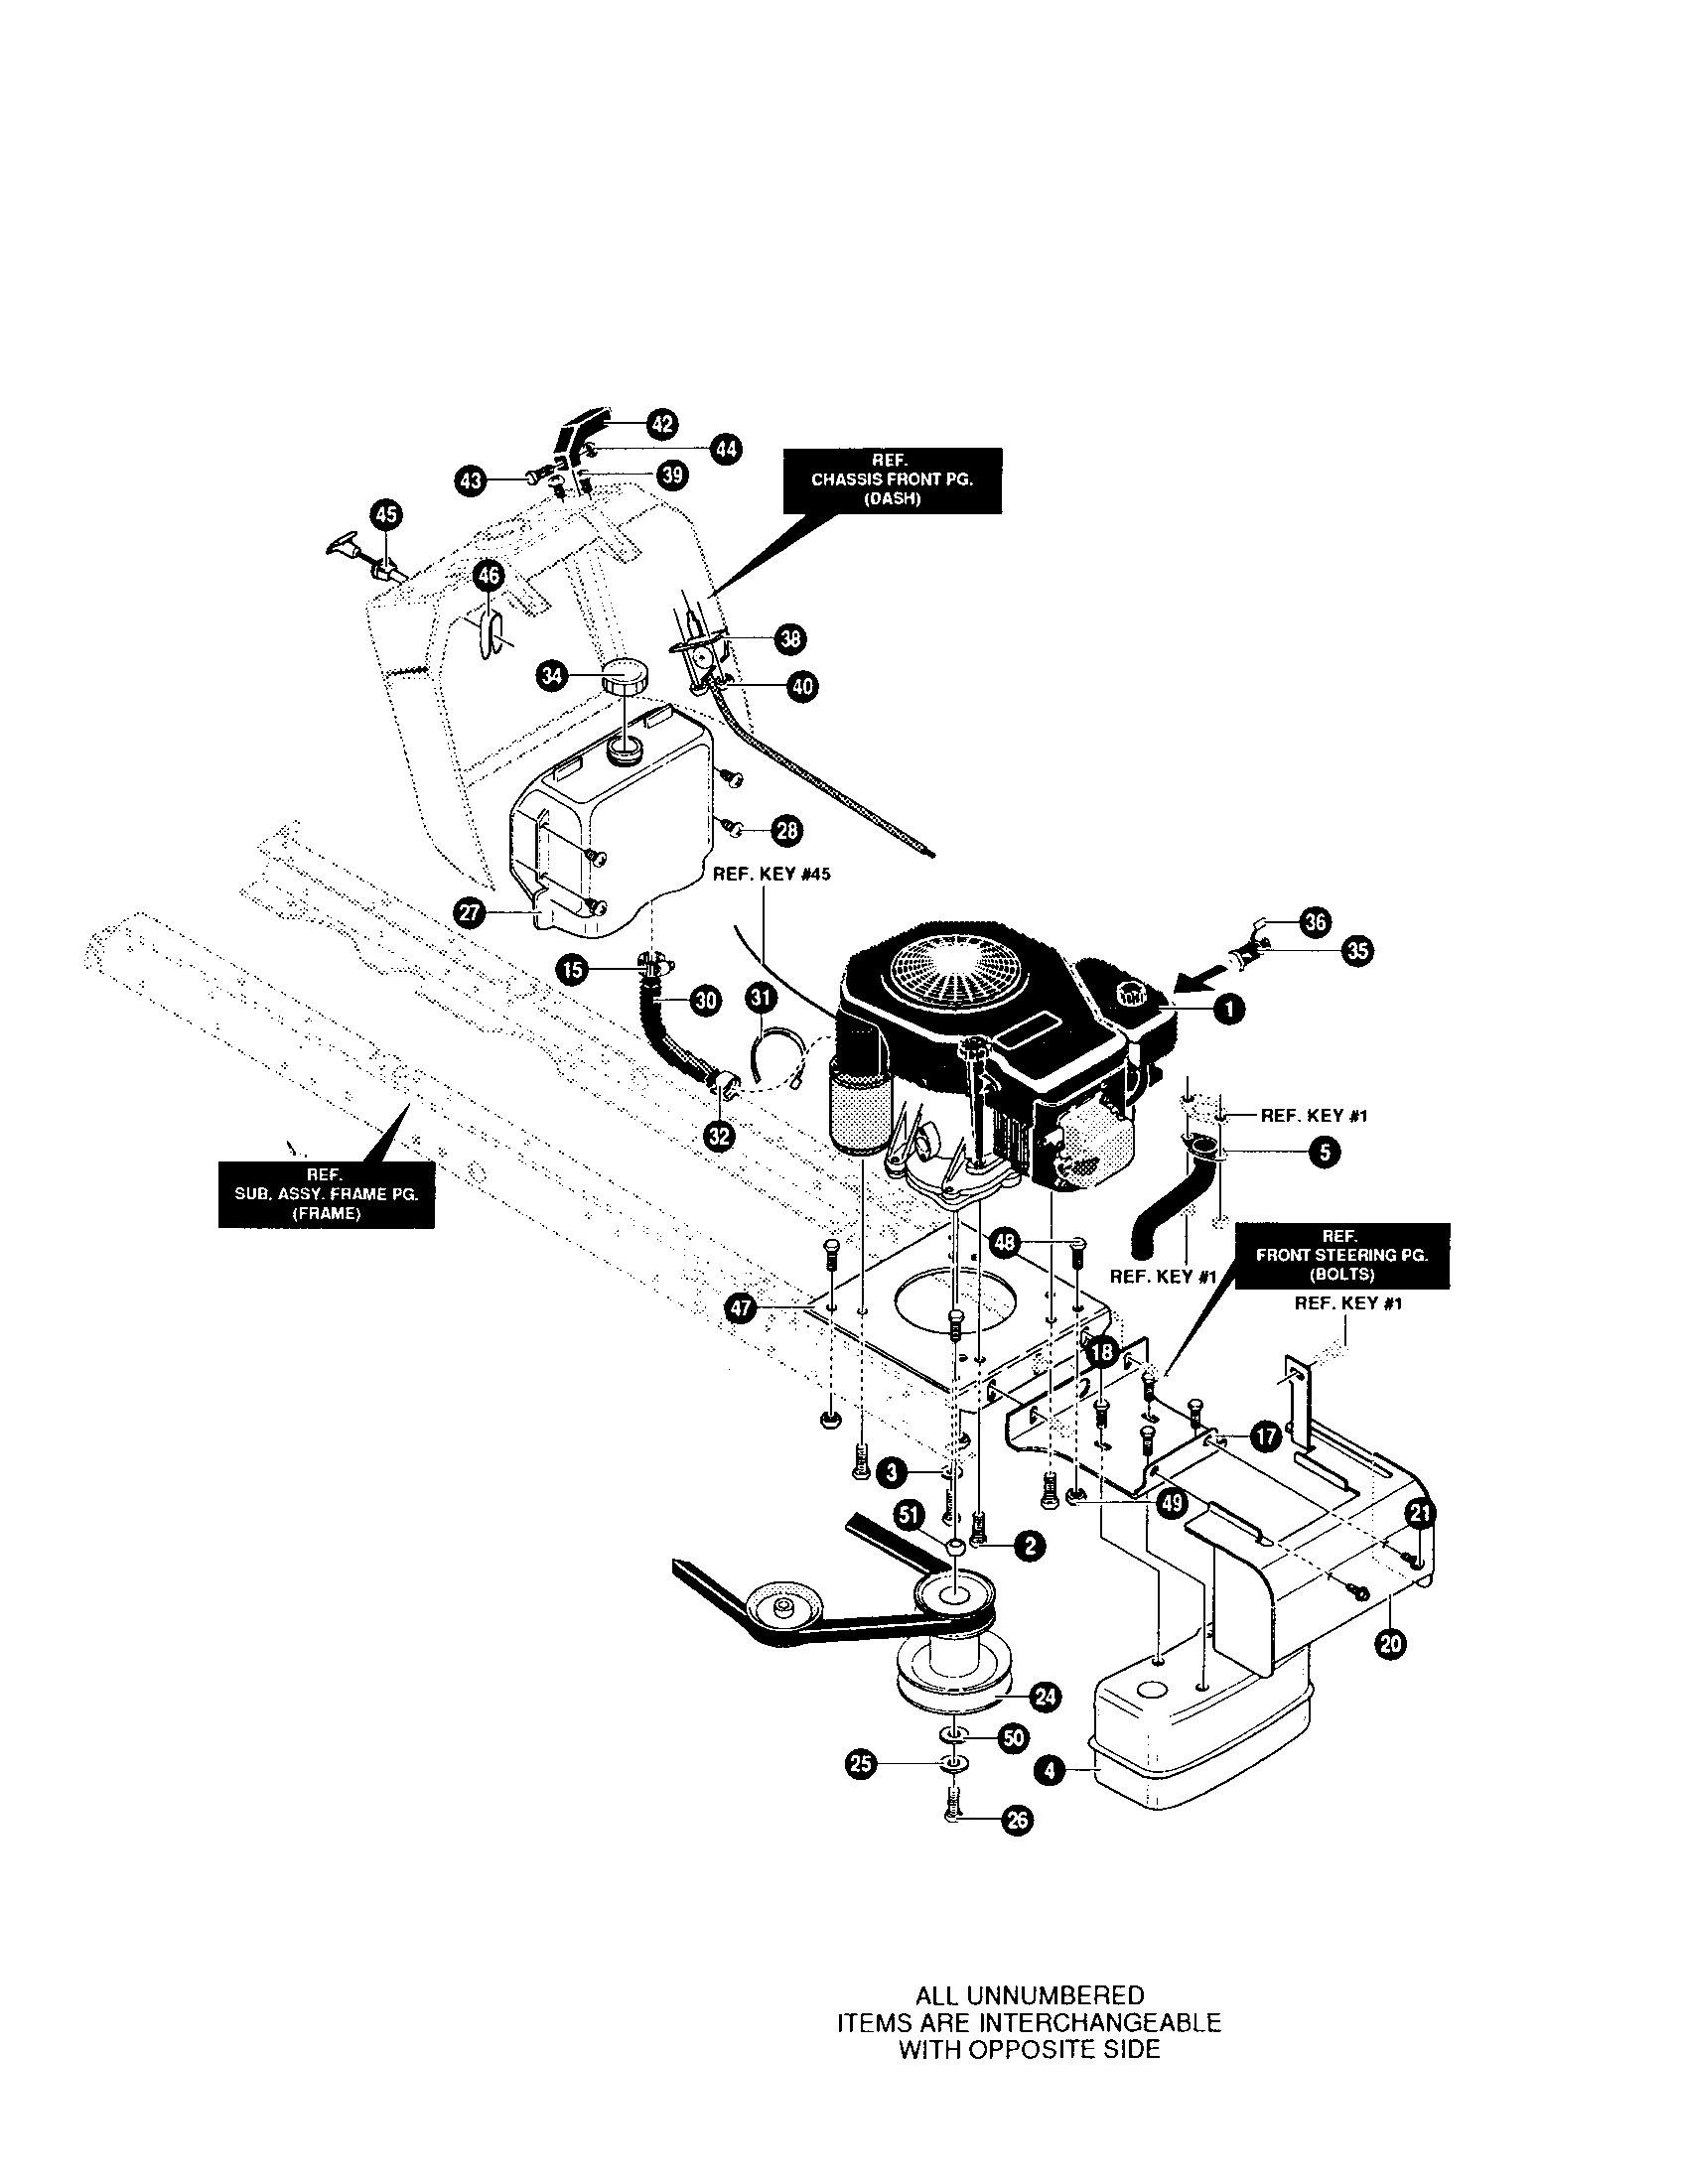 25 hp kohler engine parts diagram my wiring diagram rh detoxicrecenze com 25 hp kohler command engine manual 25 hp kohler command engine parts